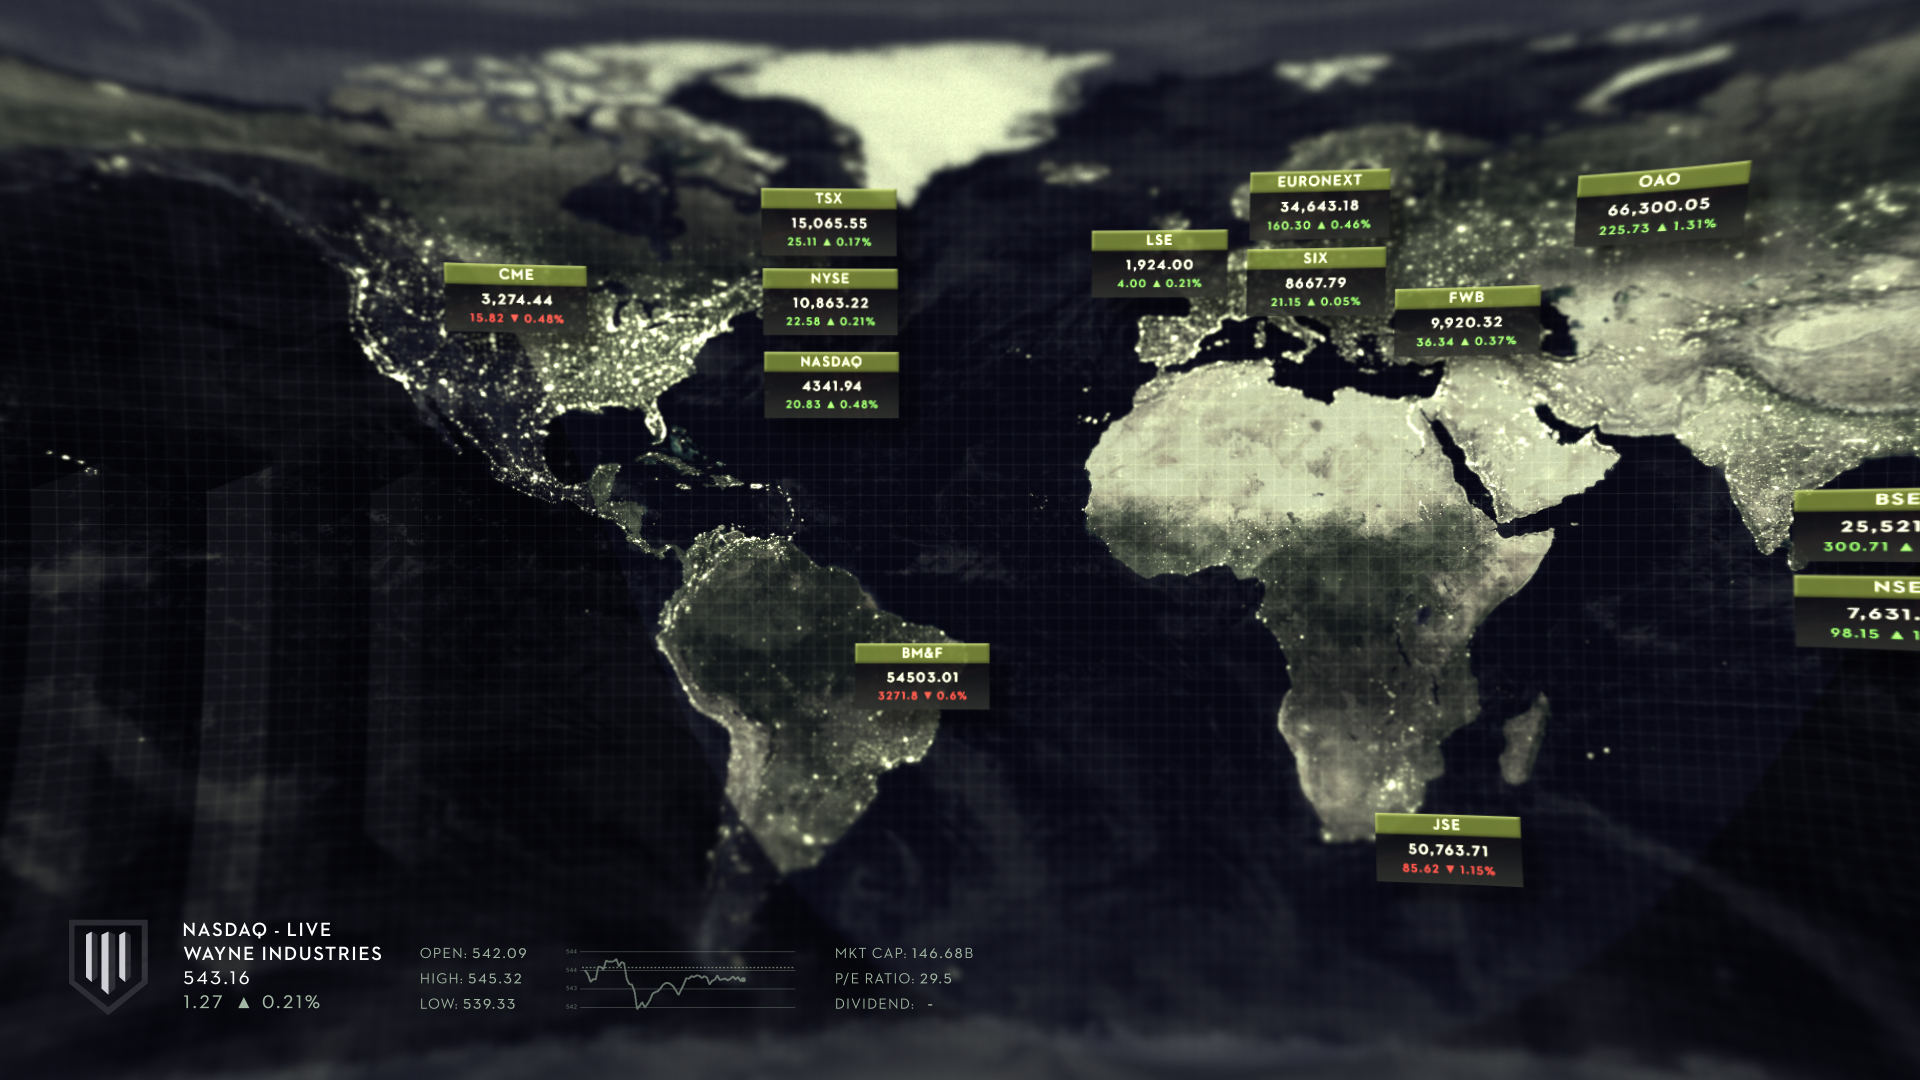 Steel2_Wayne_Stockmap_001